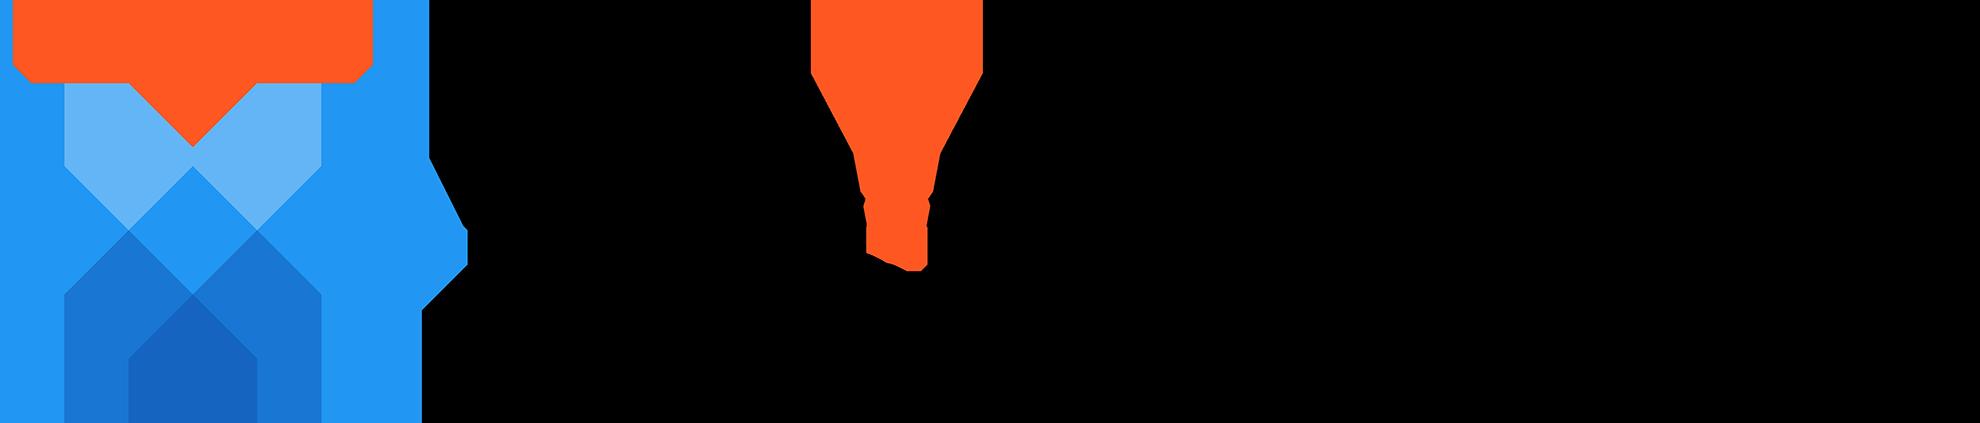 msh_logo.png